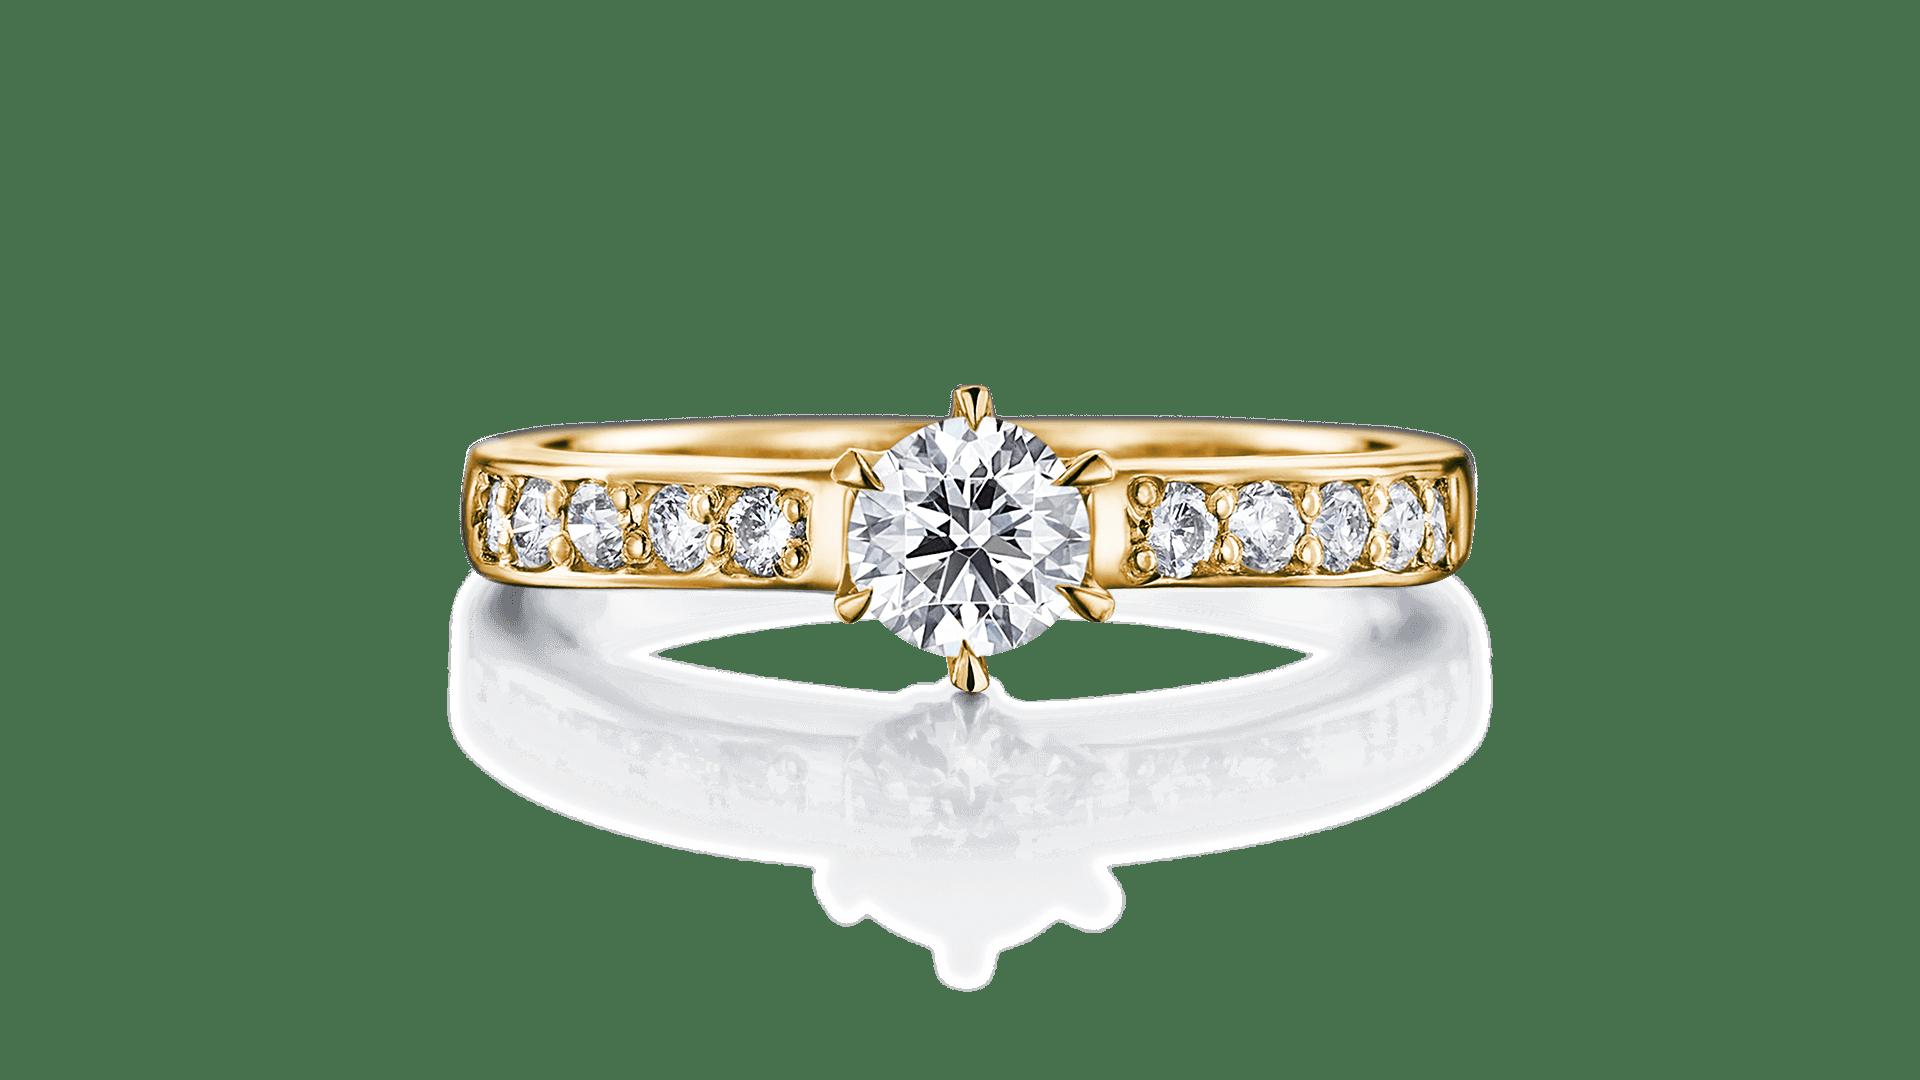 schadar シャドル | 婚約指輪サムネイル 1